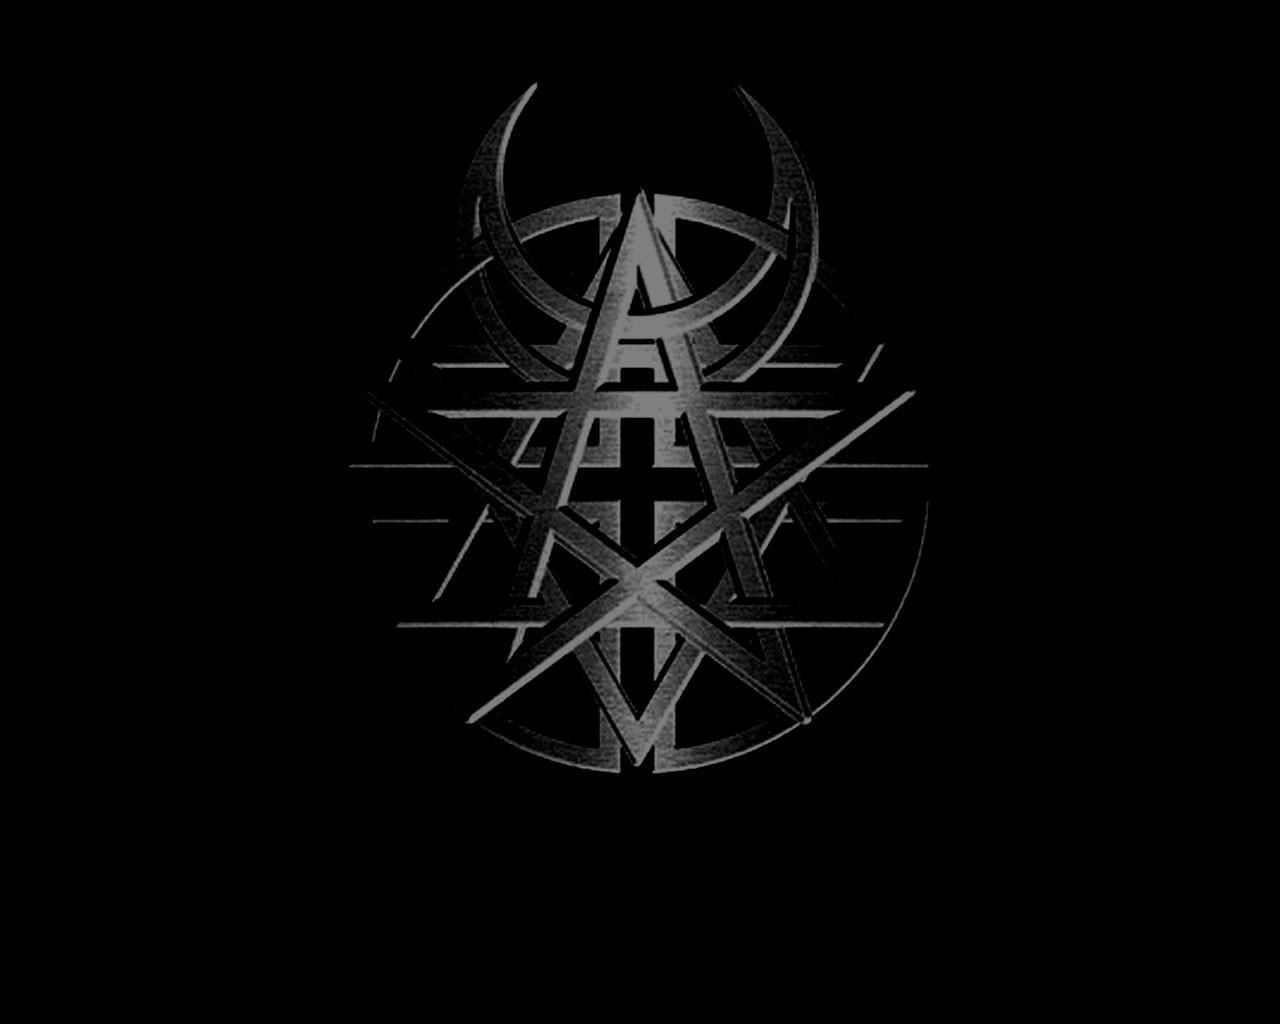 disturbed logo wallpaper - HD1280×1024